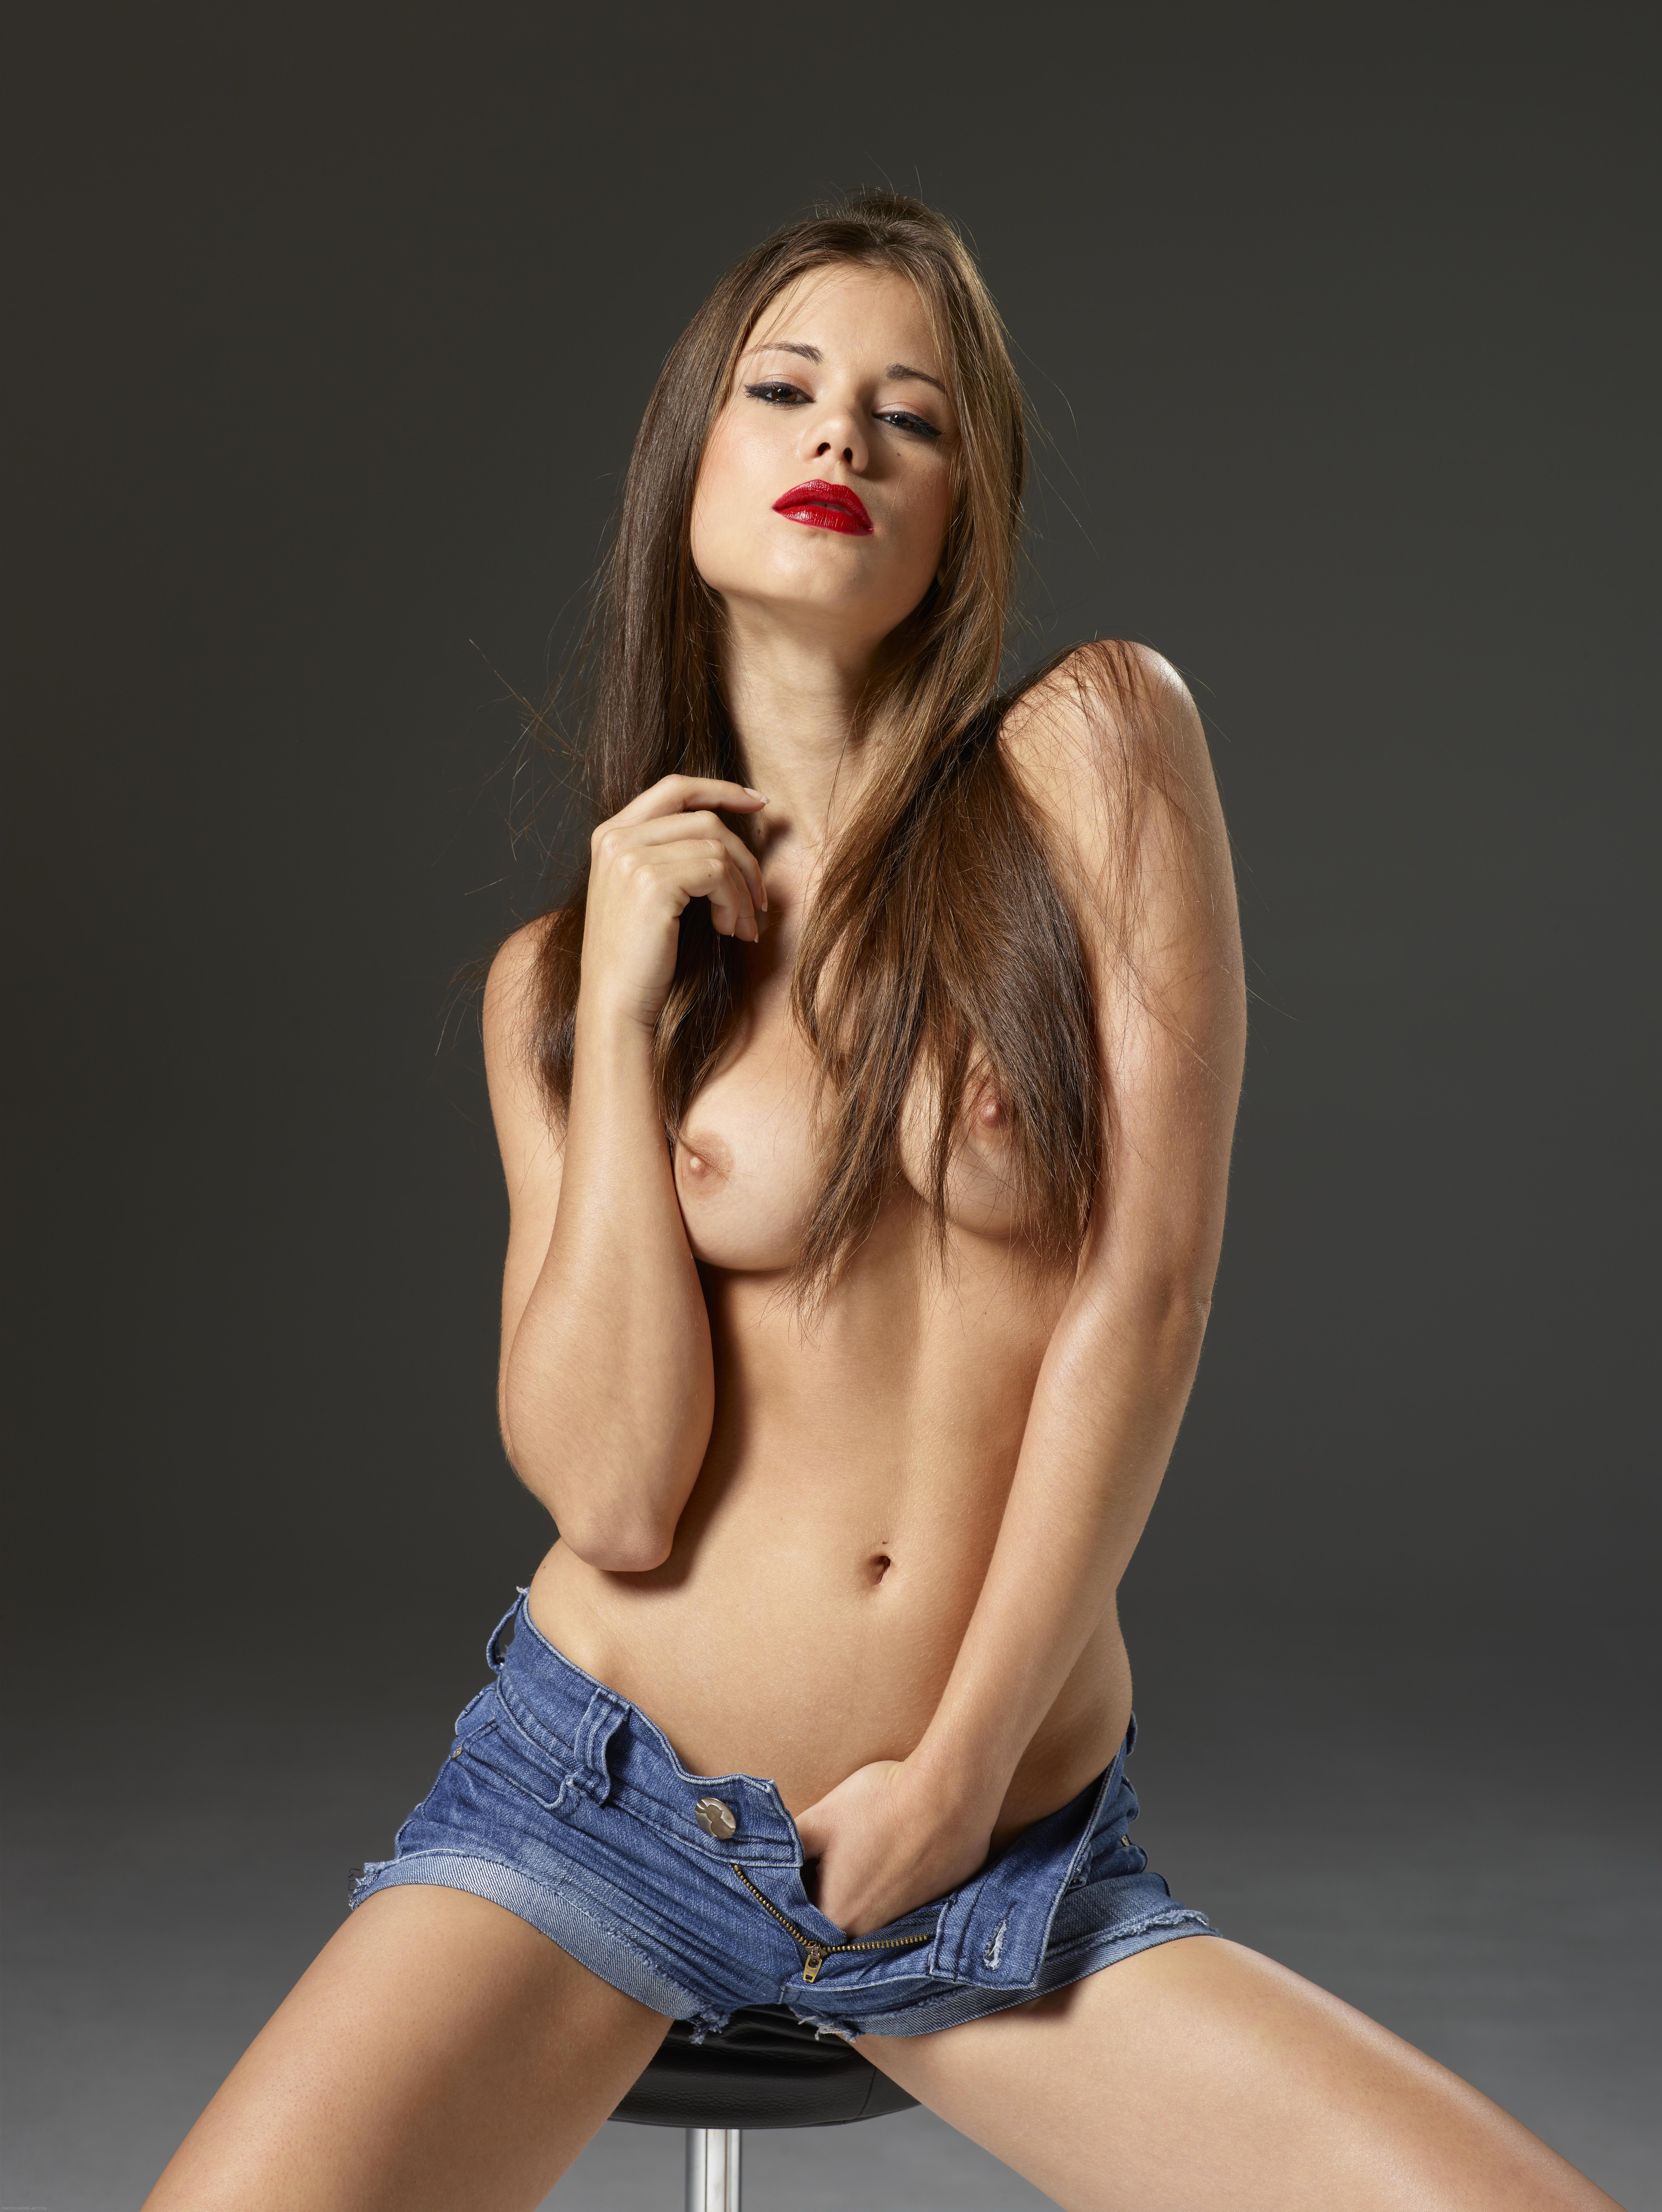 shelf bra showing nipple